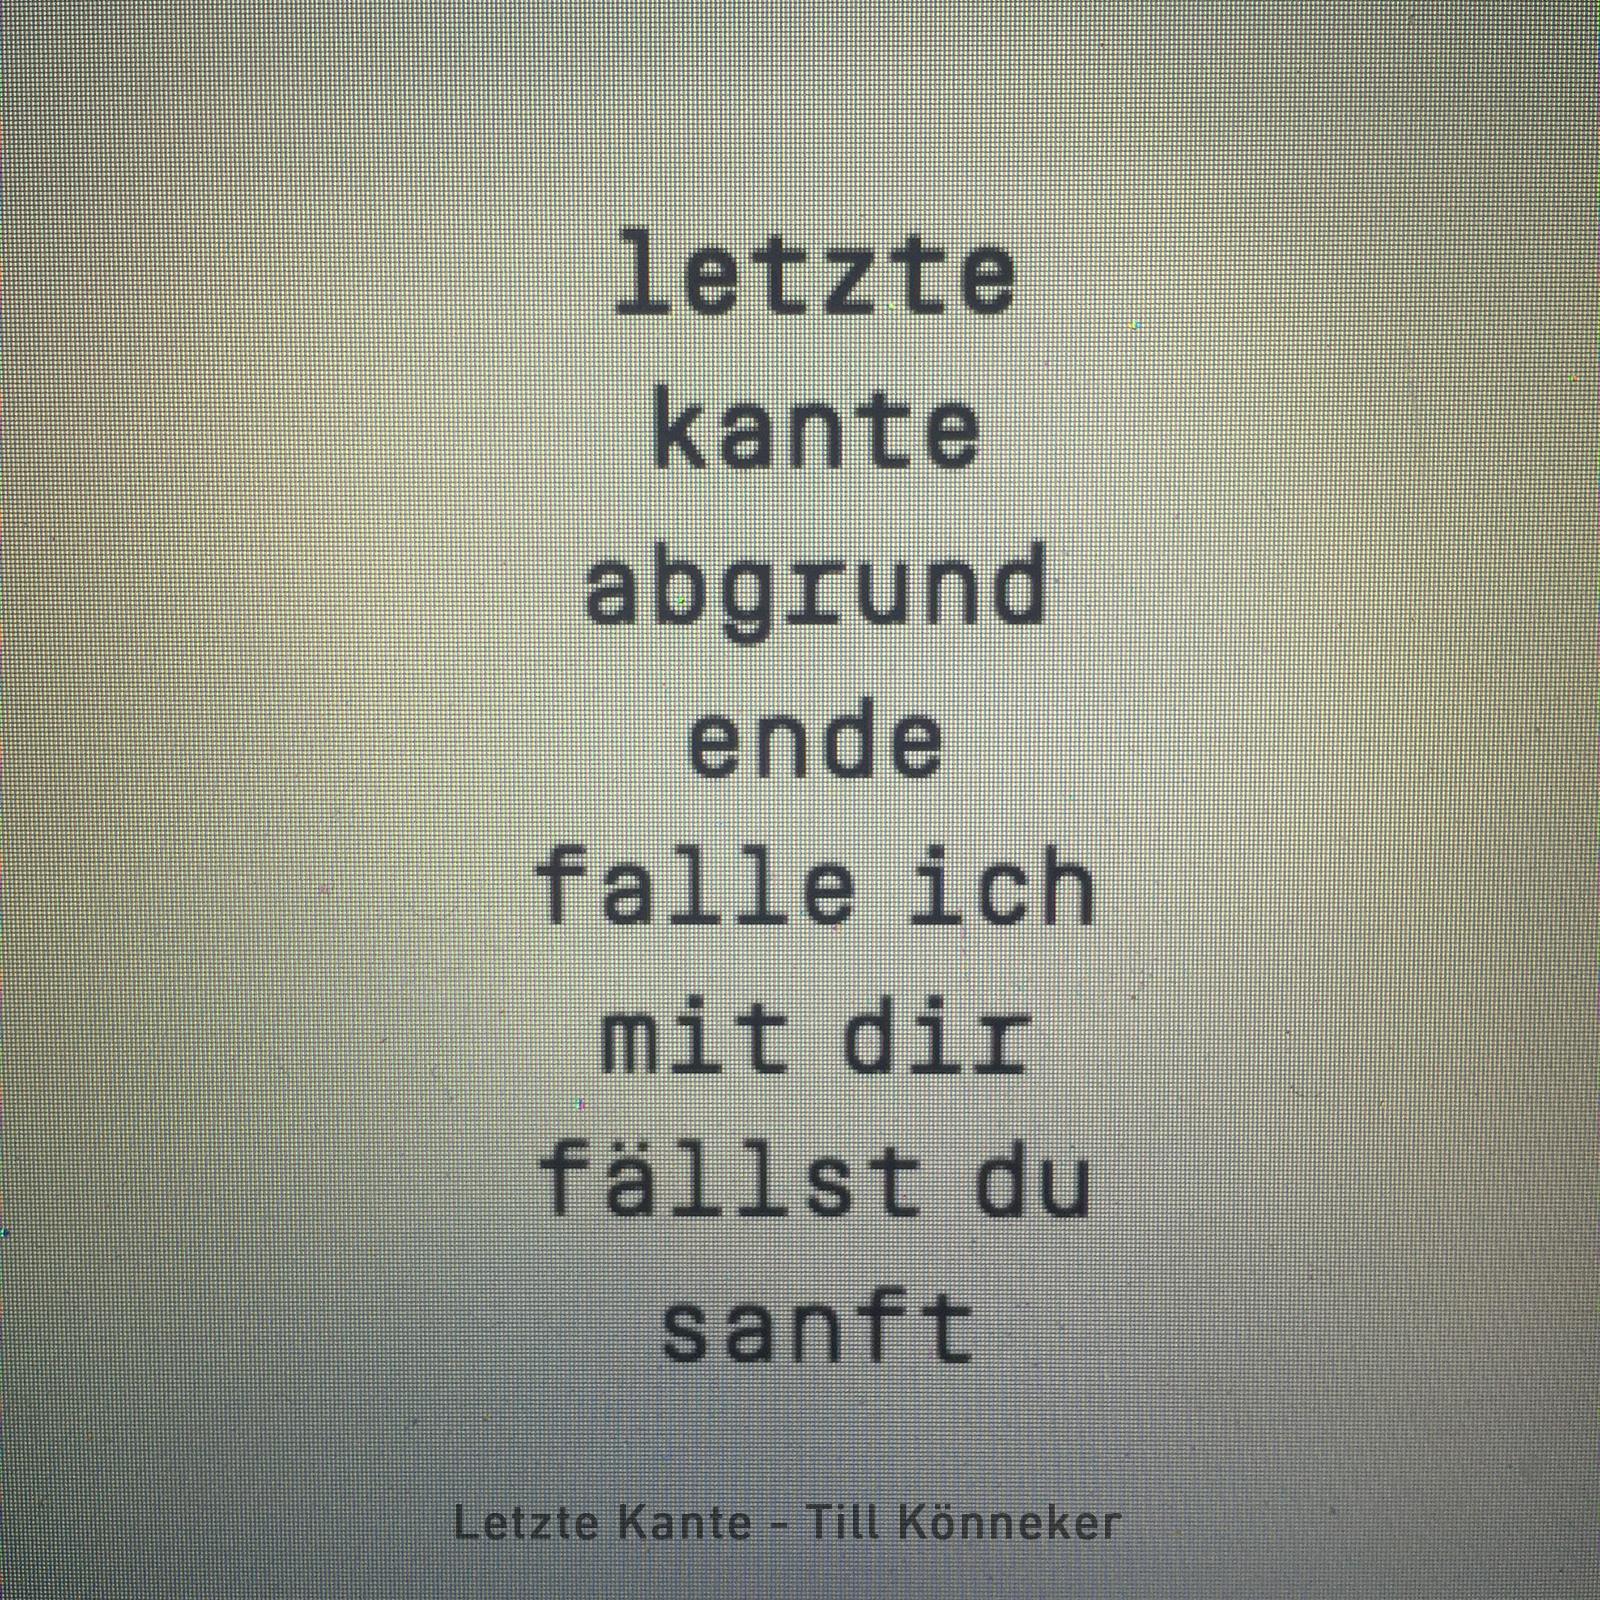 Letzte Kante - Till Könneker